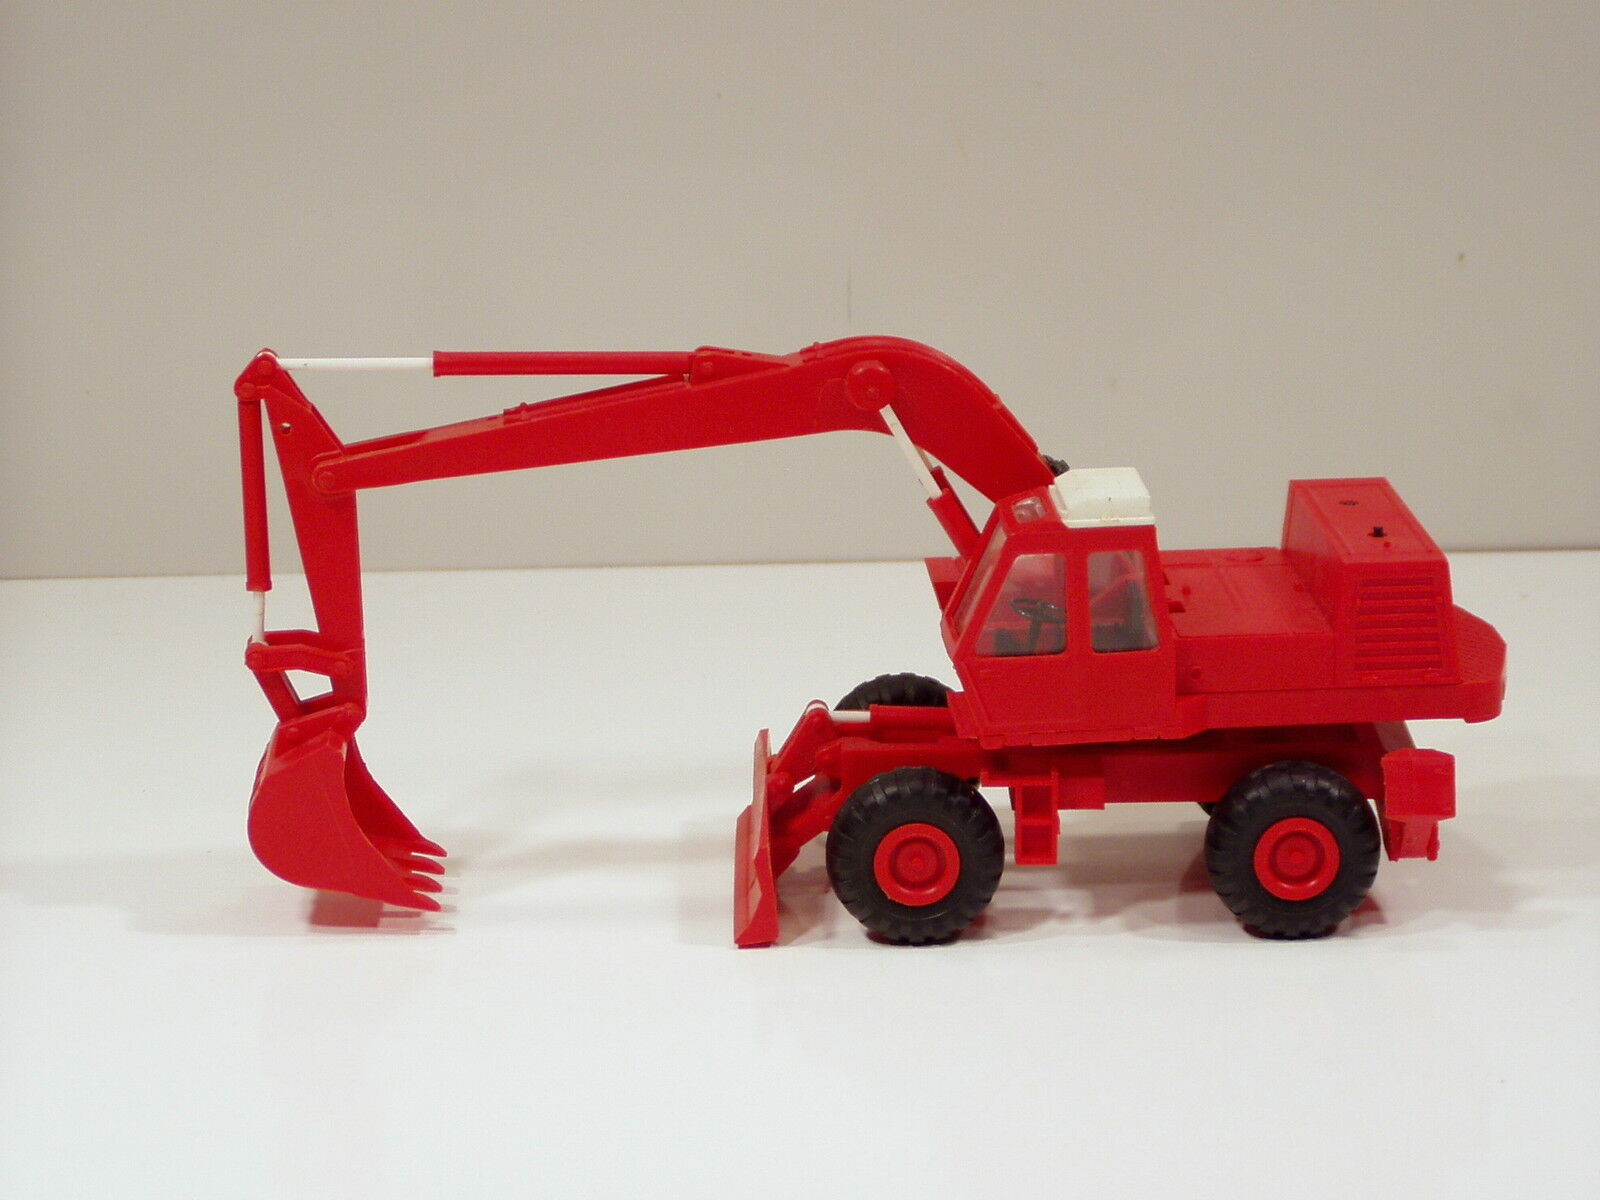 O&K Excavator - 1 43 - Plastic - Atek - Russia - No Box